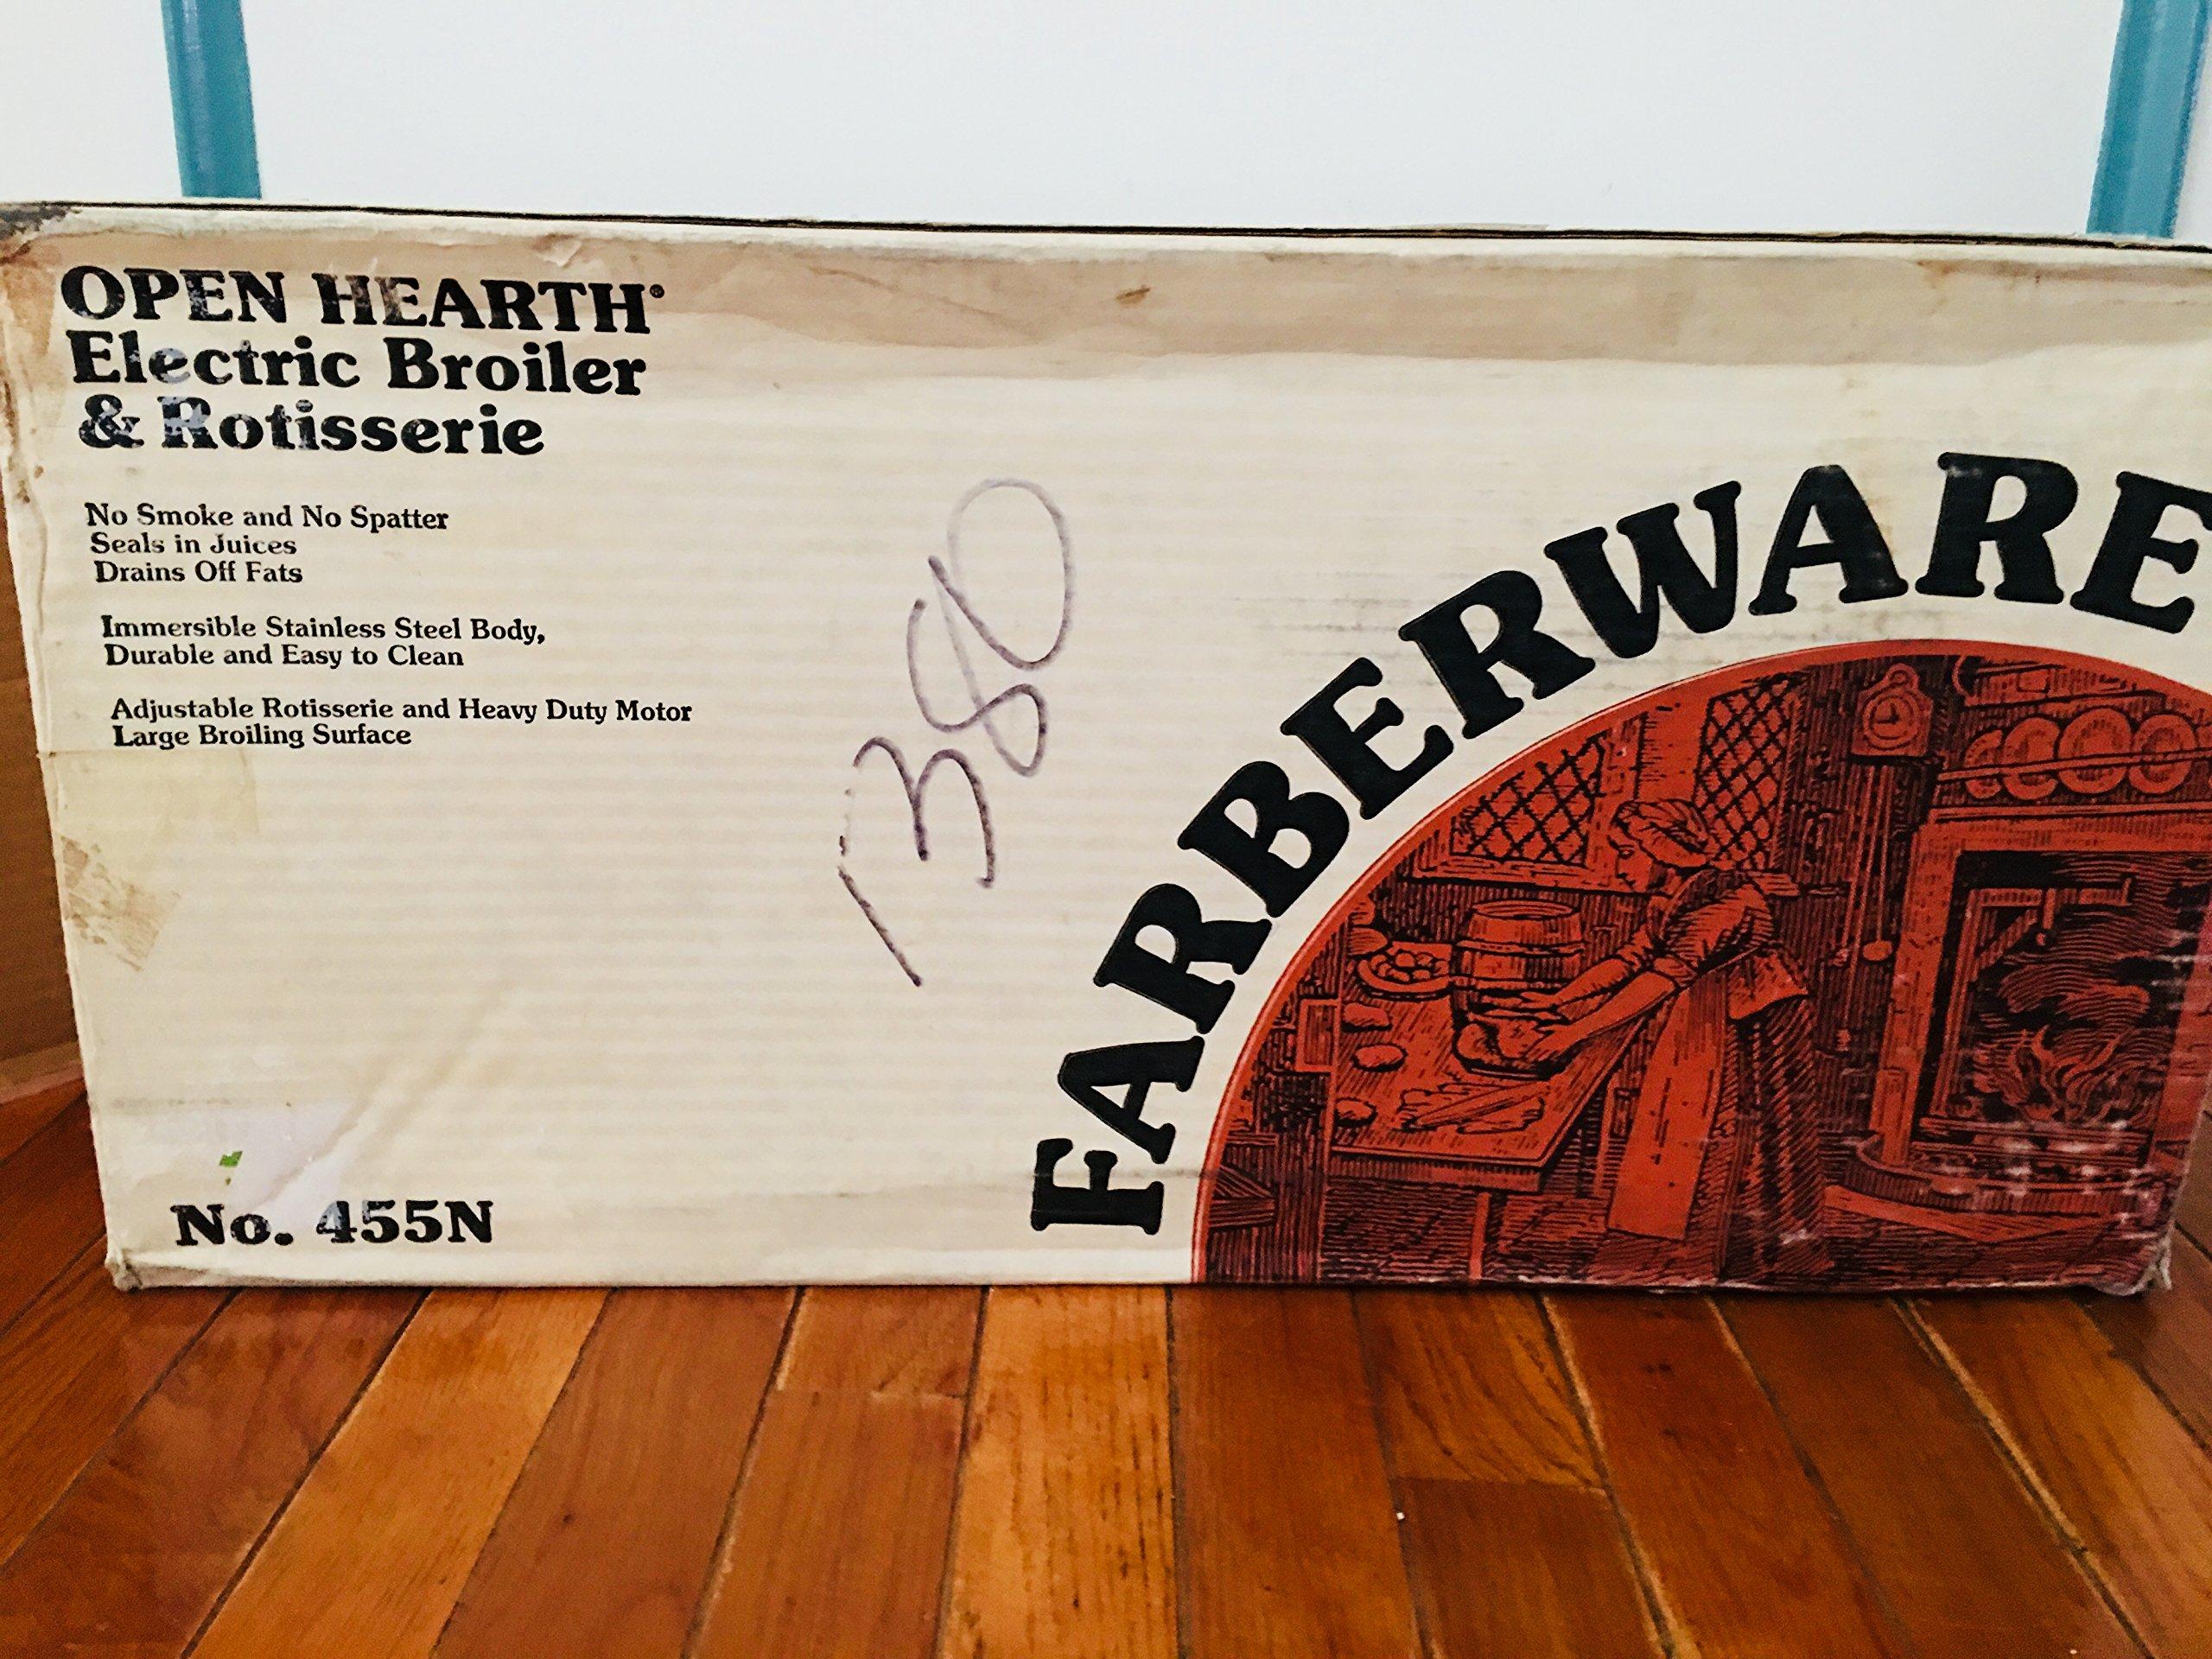 Farberware Open Hearth Broiler & Rotisserie by Farberware